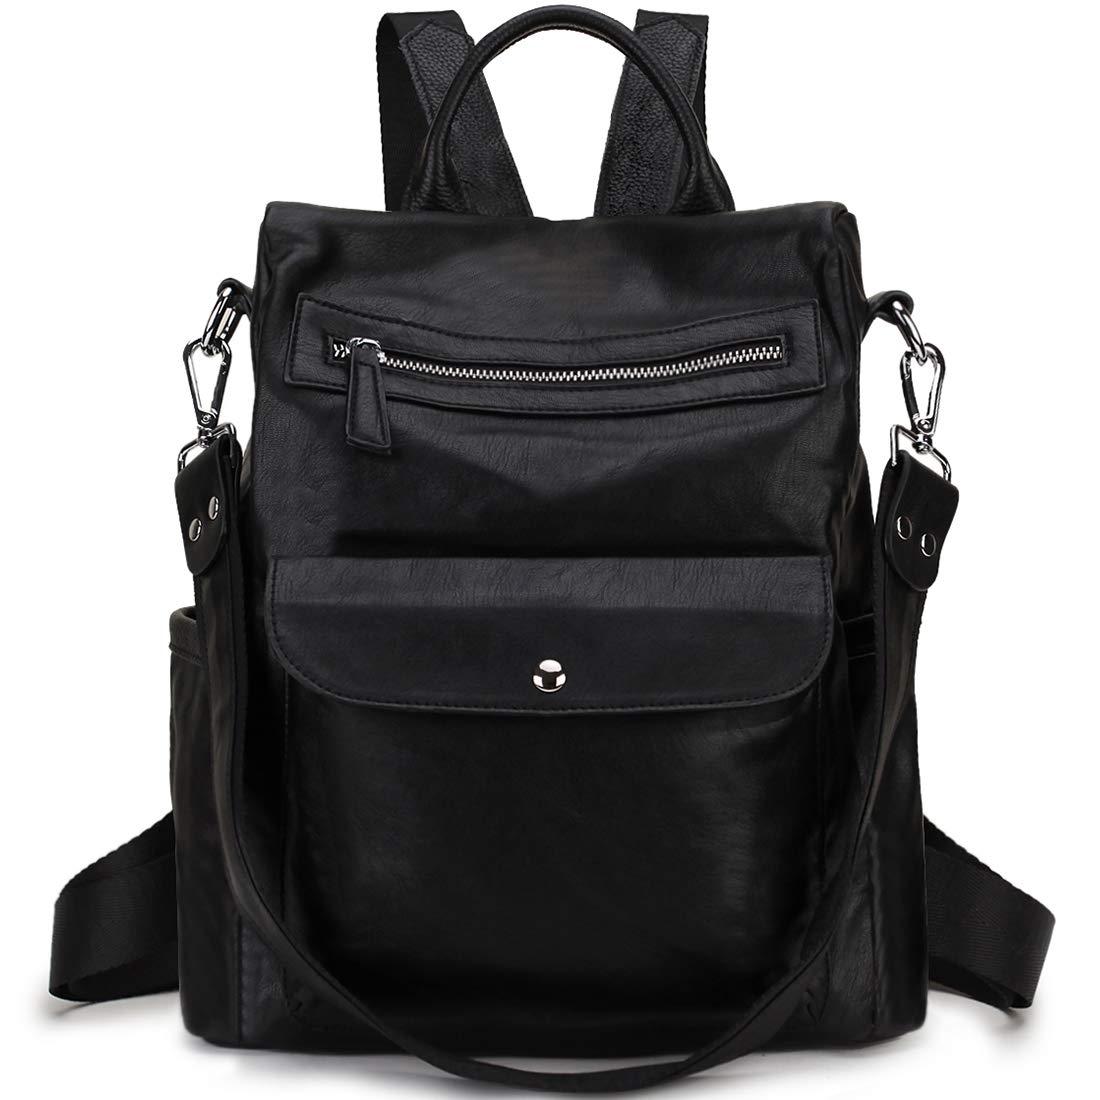 VX VONXURY レディース VXWB021 US サイズ: S カラー: ブラック B07RHJ2TY8 Black Backpack